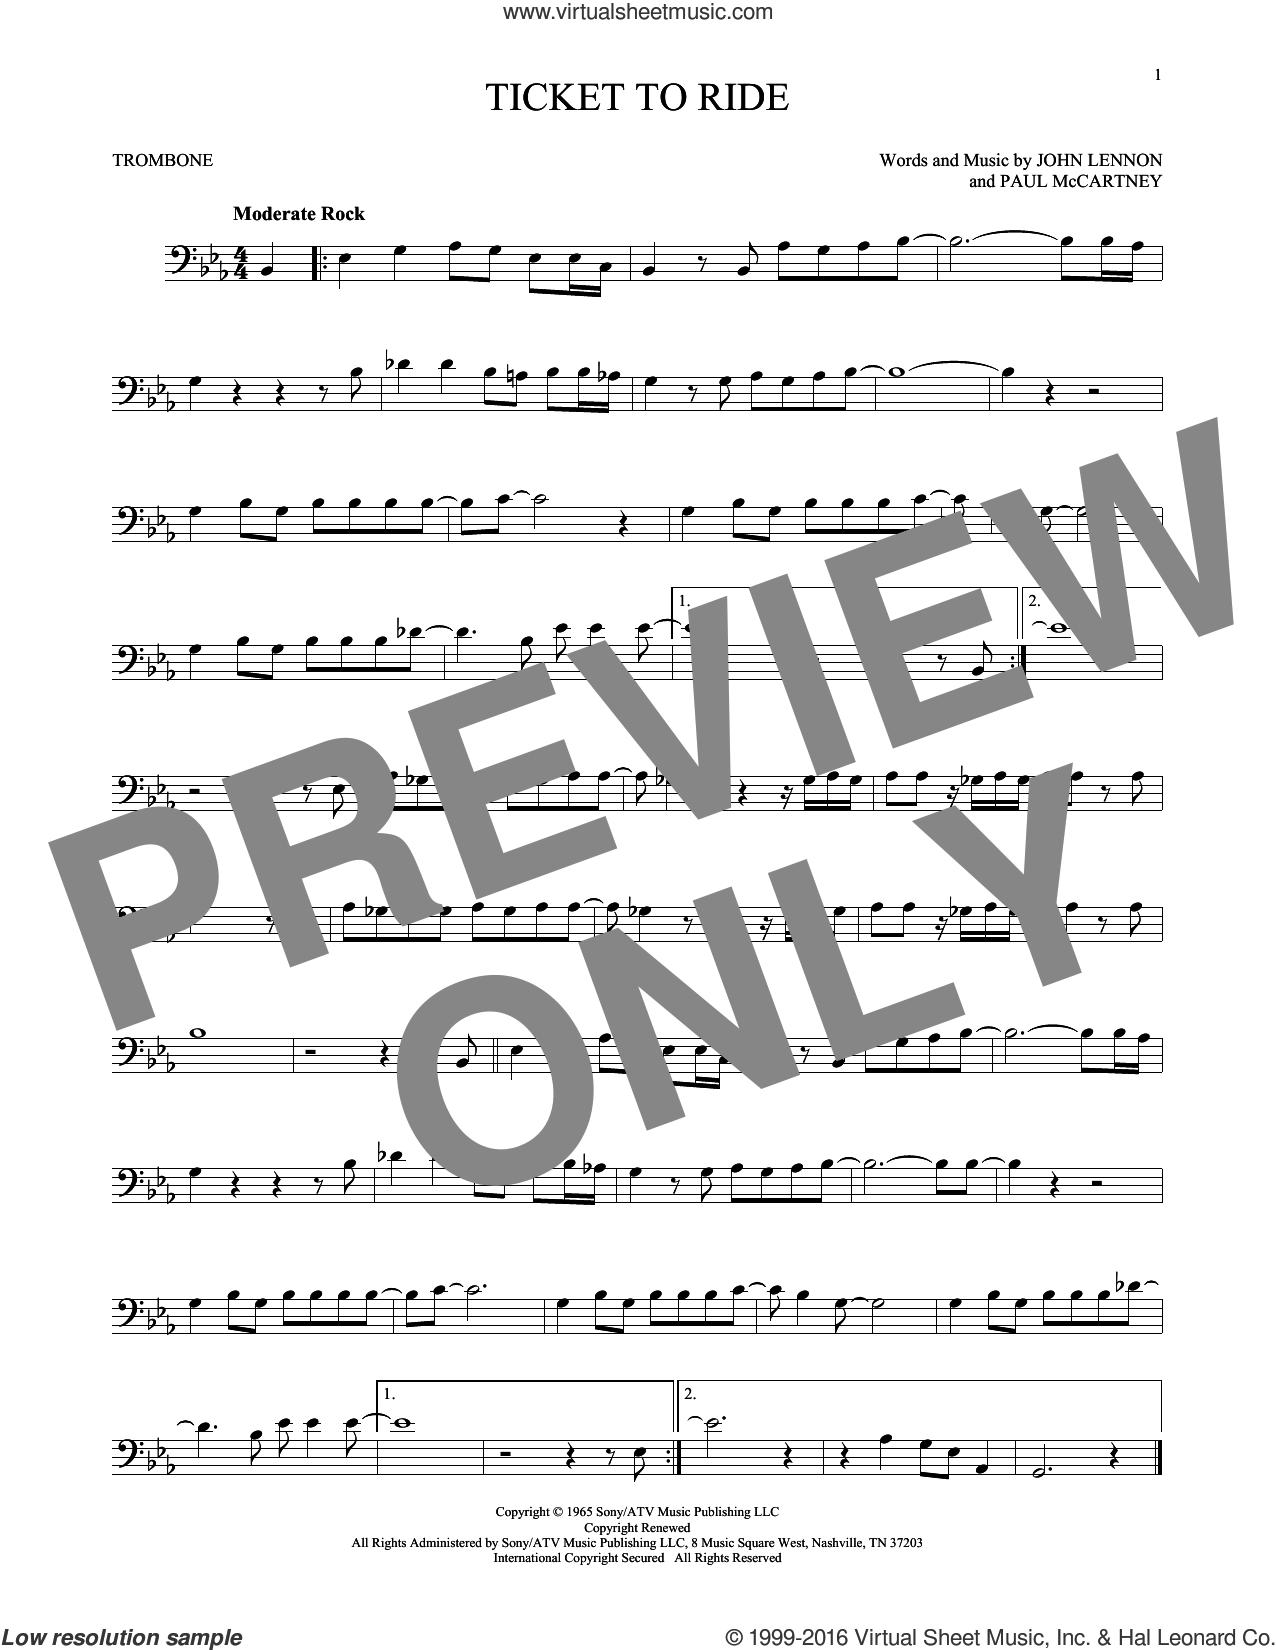 Ticket To Ride sheet music for trombone solo by The Beatles, John Lennon and Paul McCartney, intermediate skill level